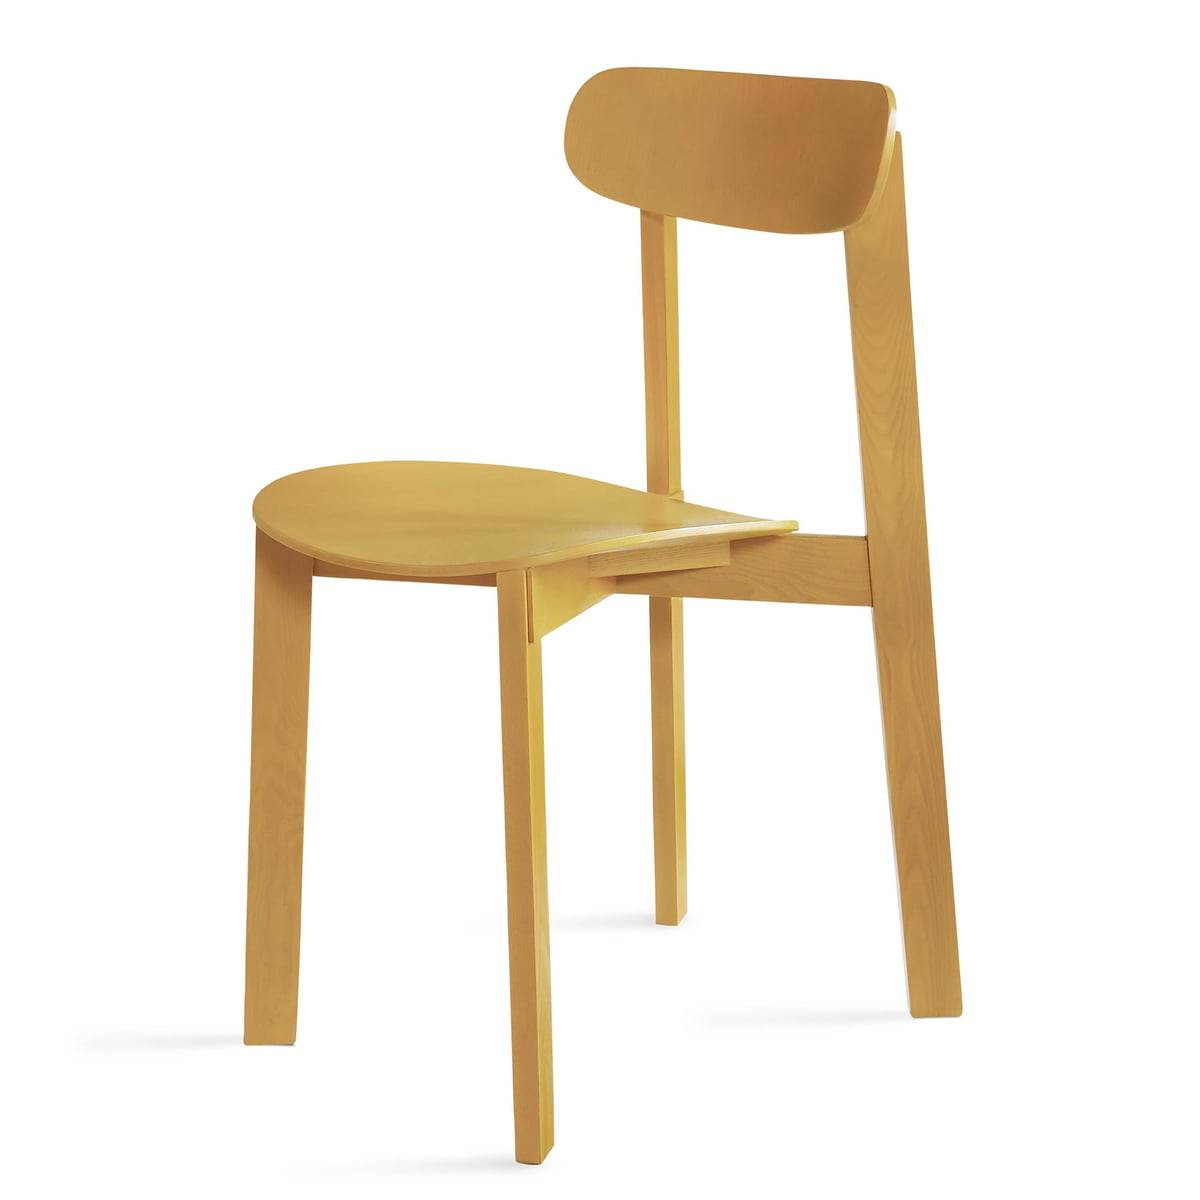 Please wait to be seated - Chaise bondi, jaune curcuma